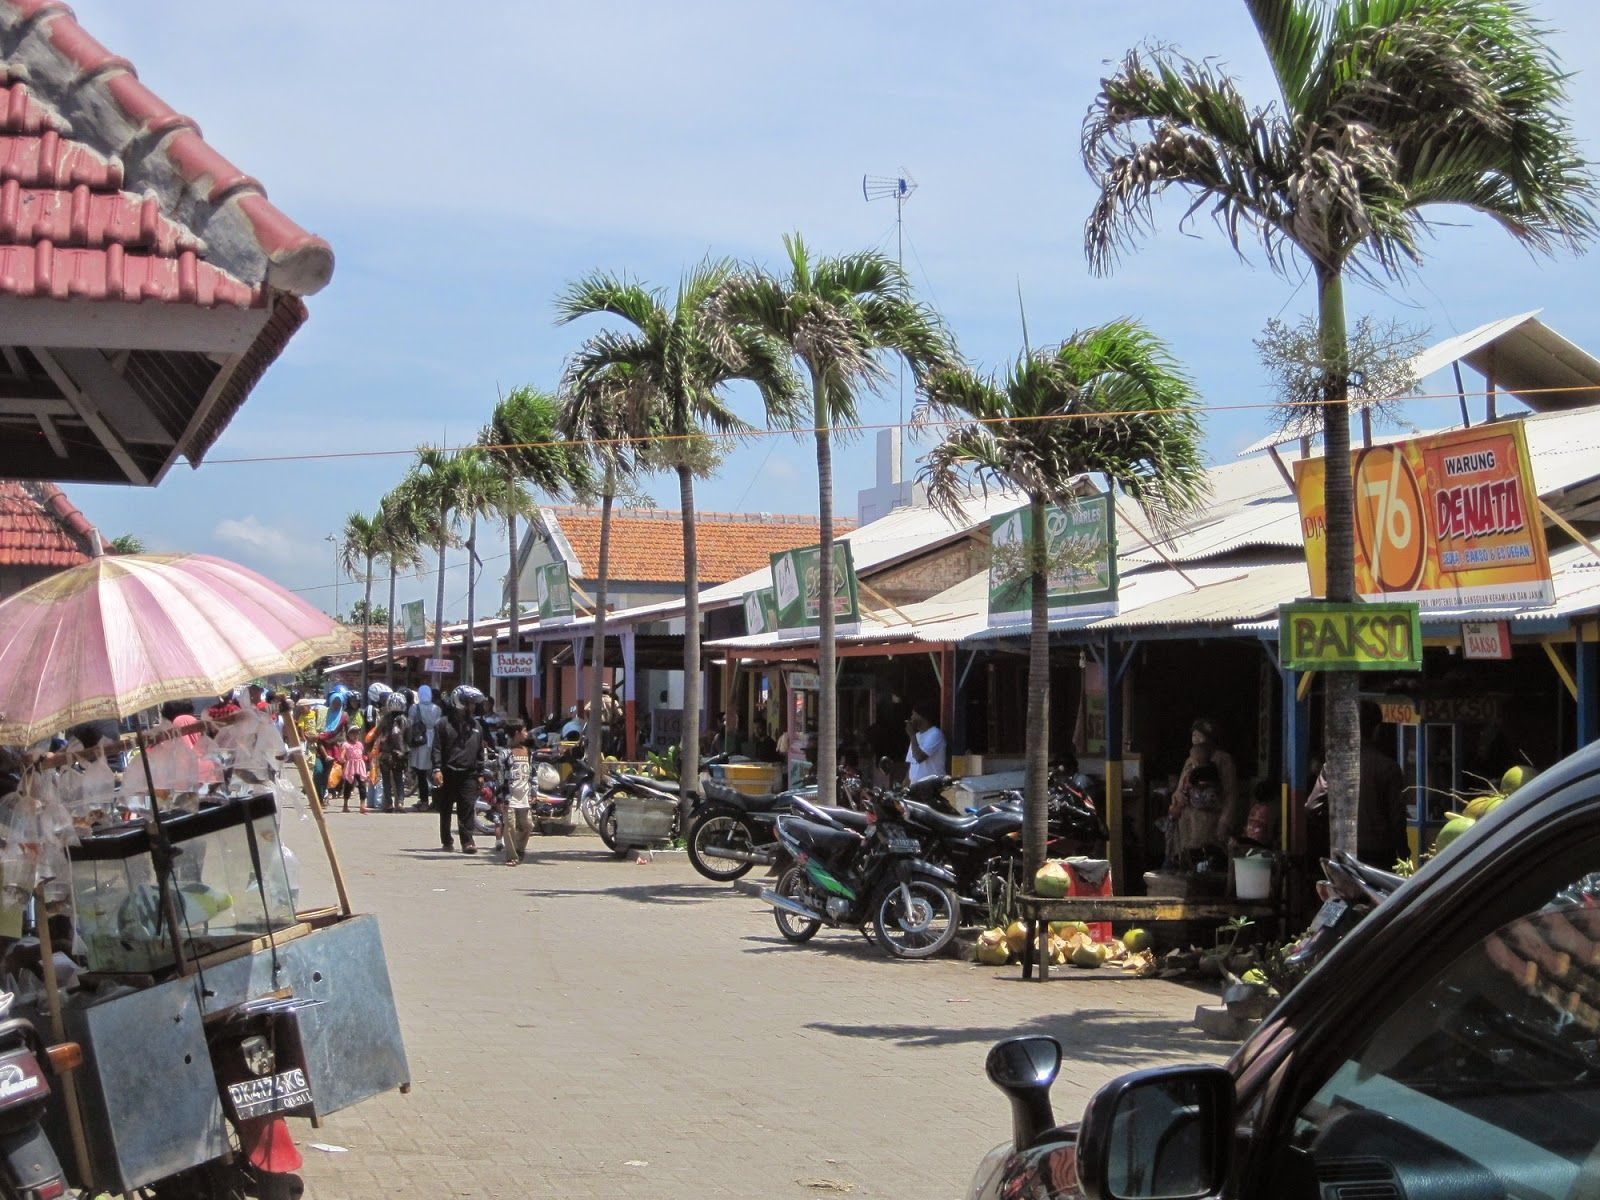 65 Tempat Wisata Banyuwangi Terkenal Menarik Dikunjungi Pantai Blimbingsari Kab